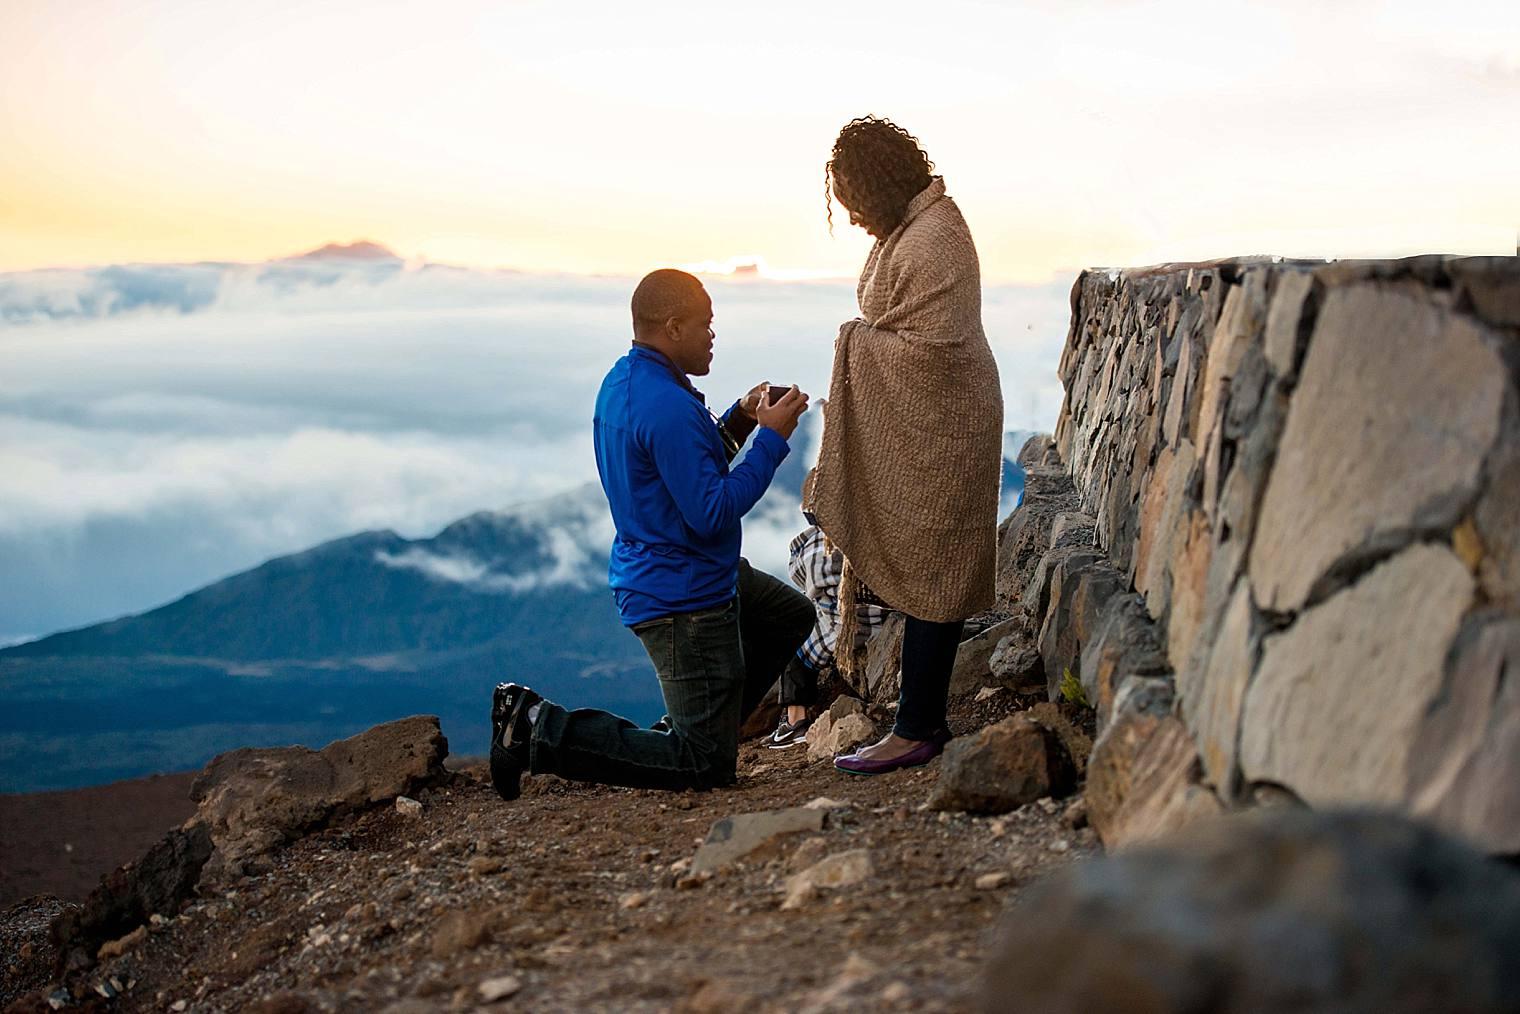 Prosbert + Giselle | Haleakala Sunrise Proposal Photographer